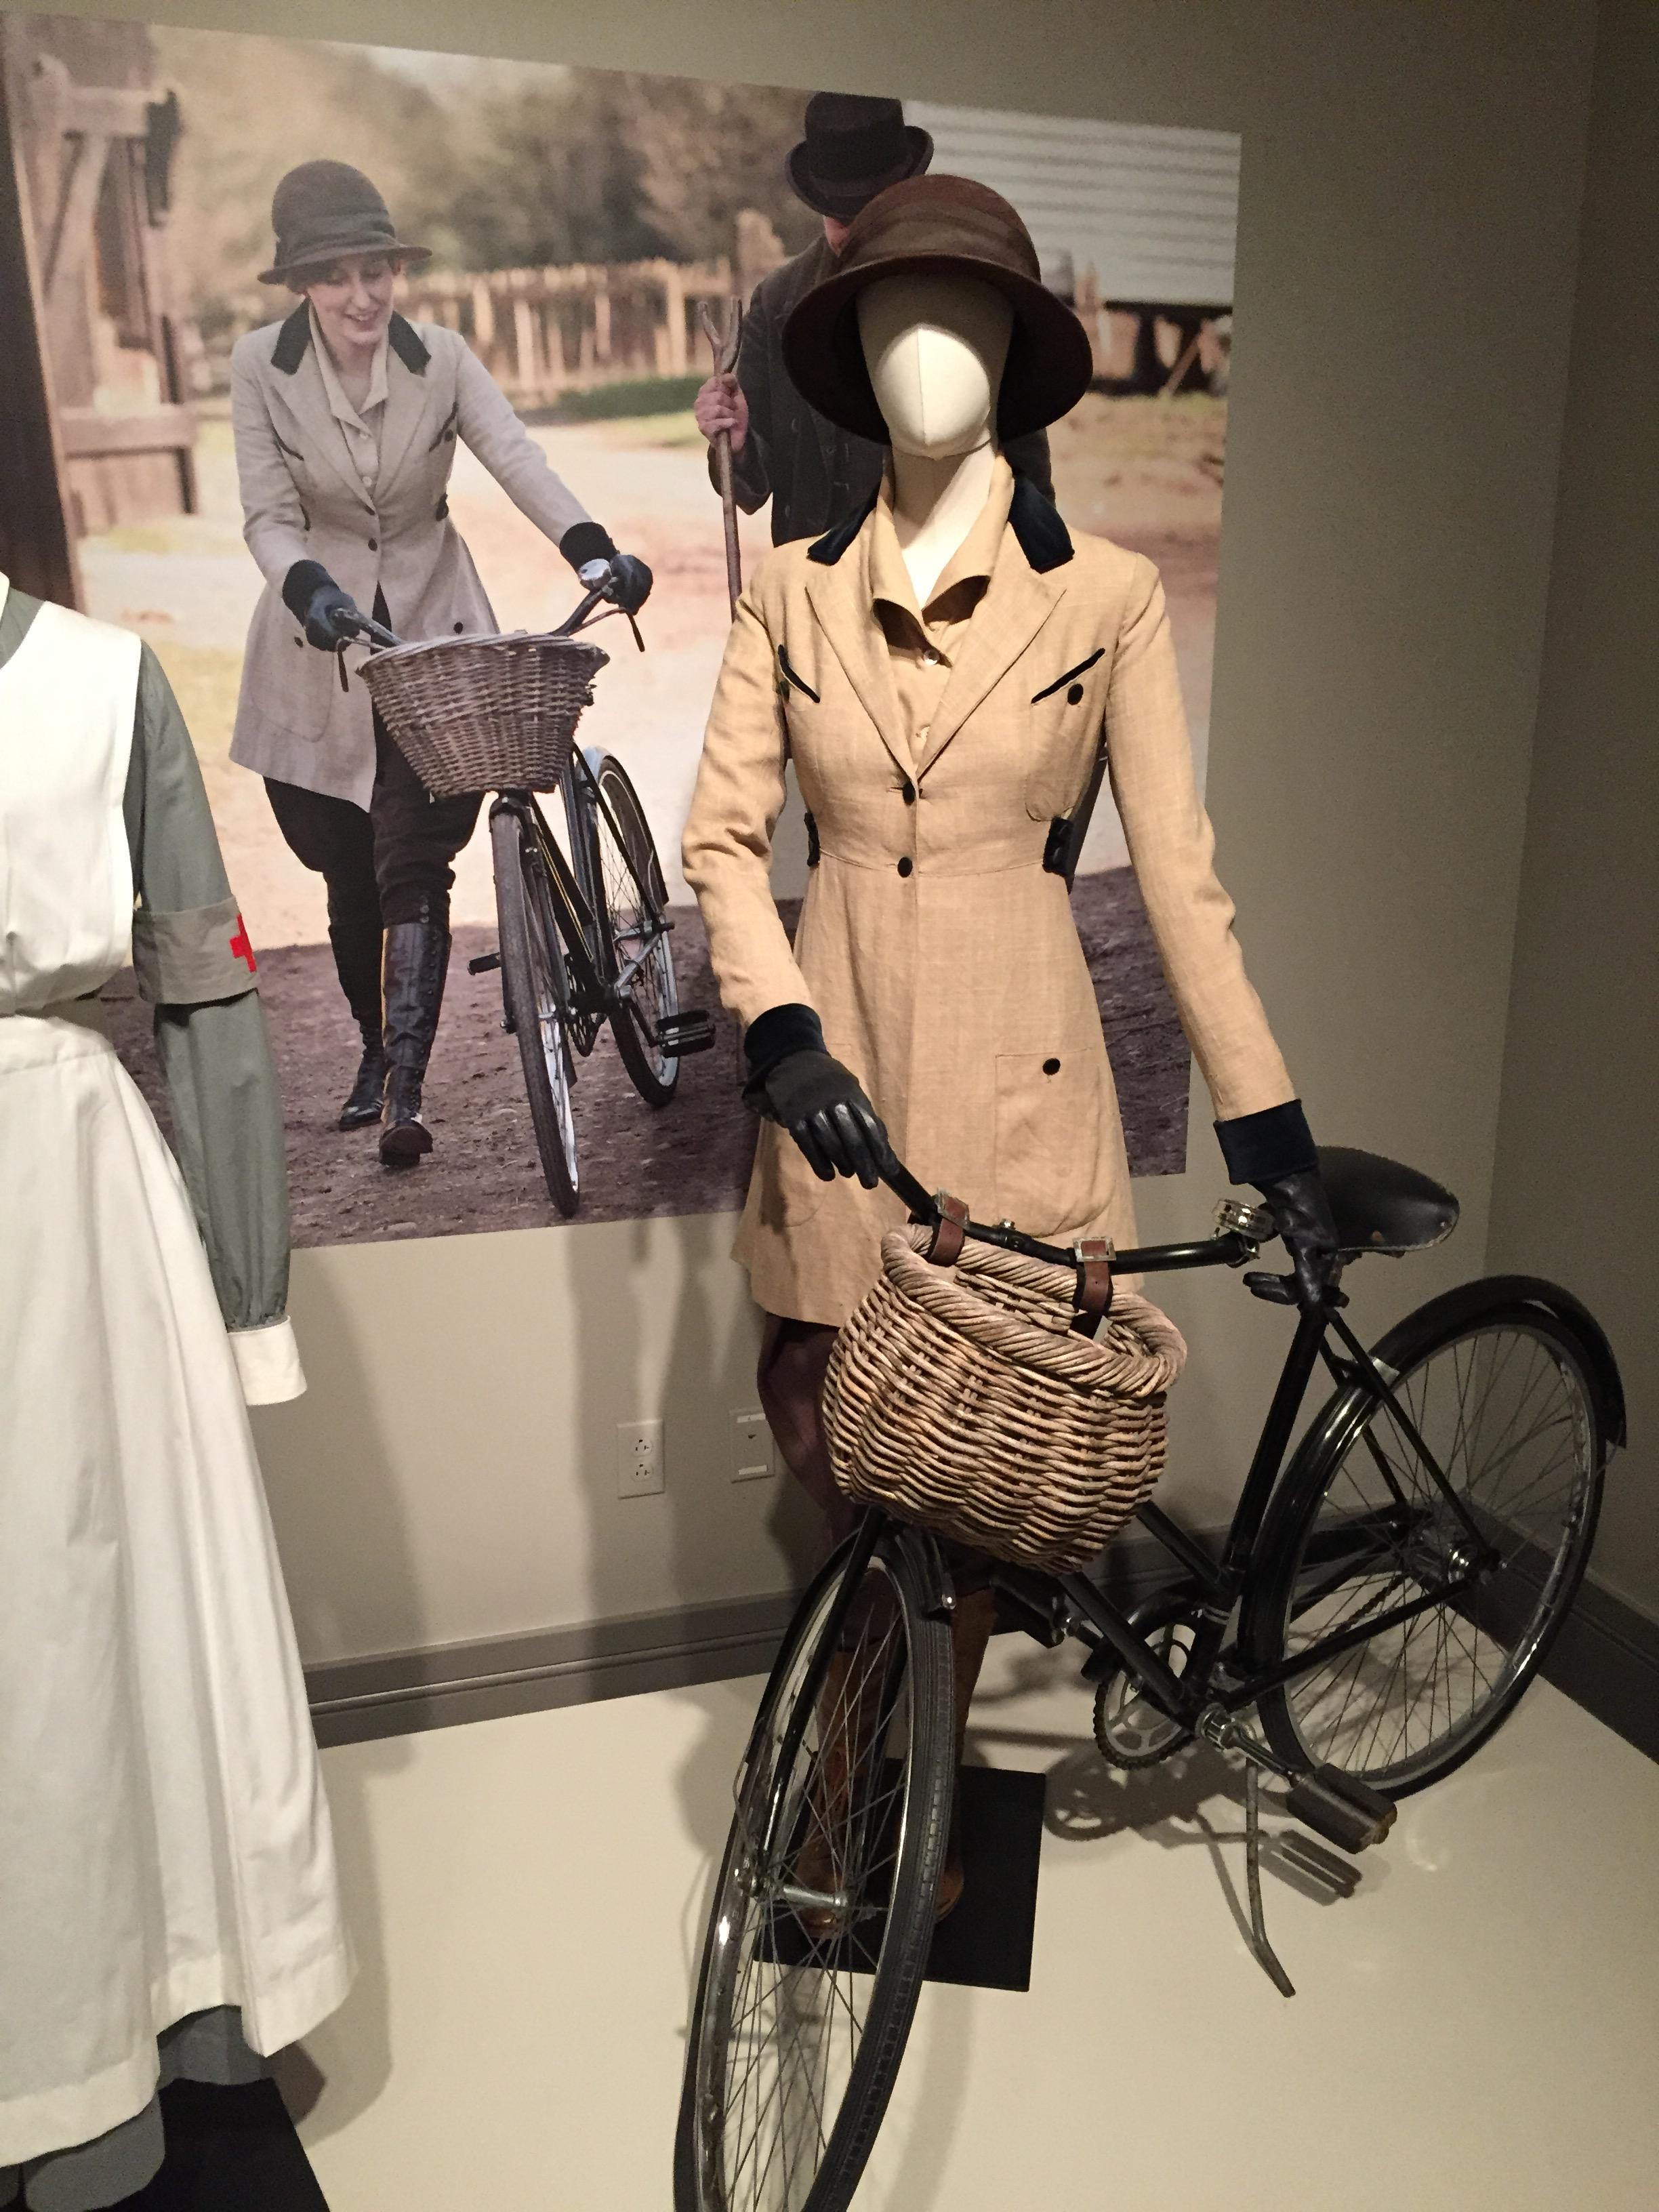 Lady Edith Crawley in her riding attire.